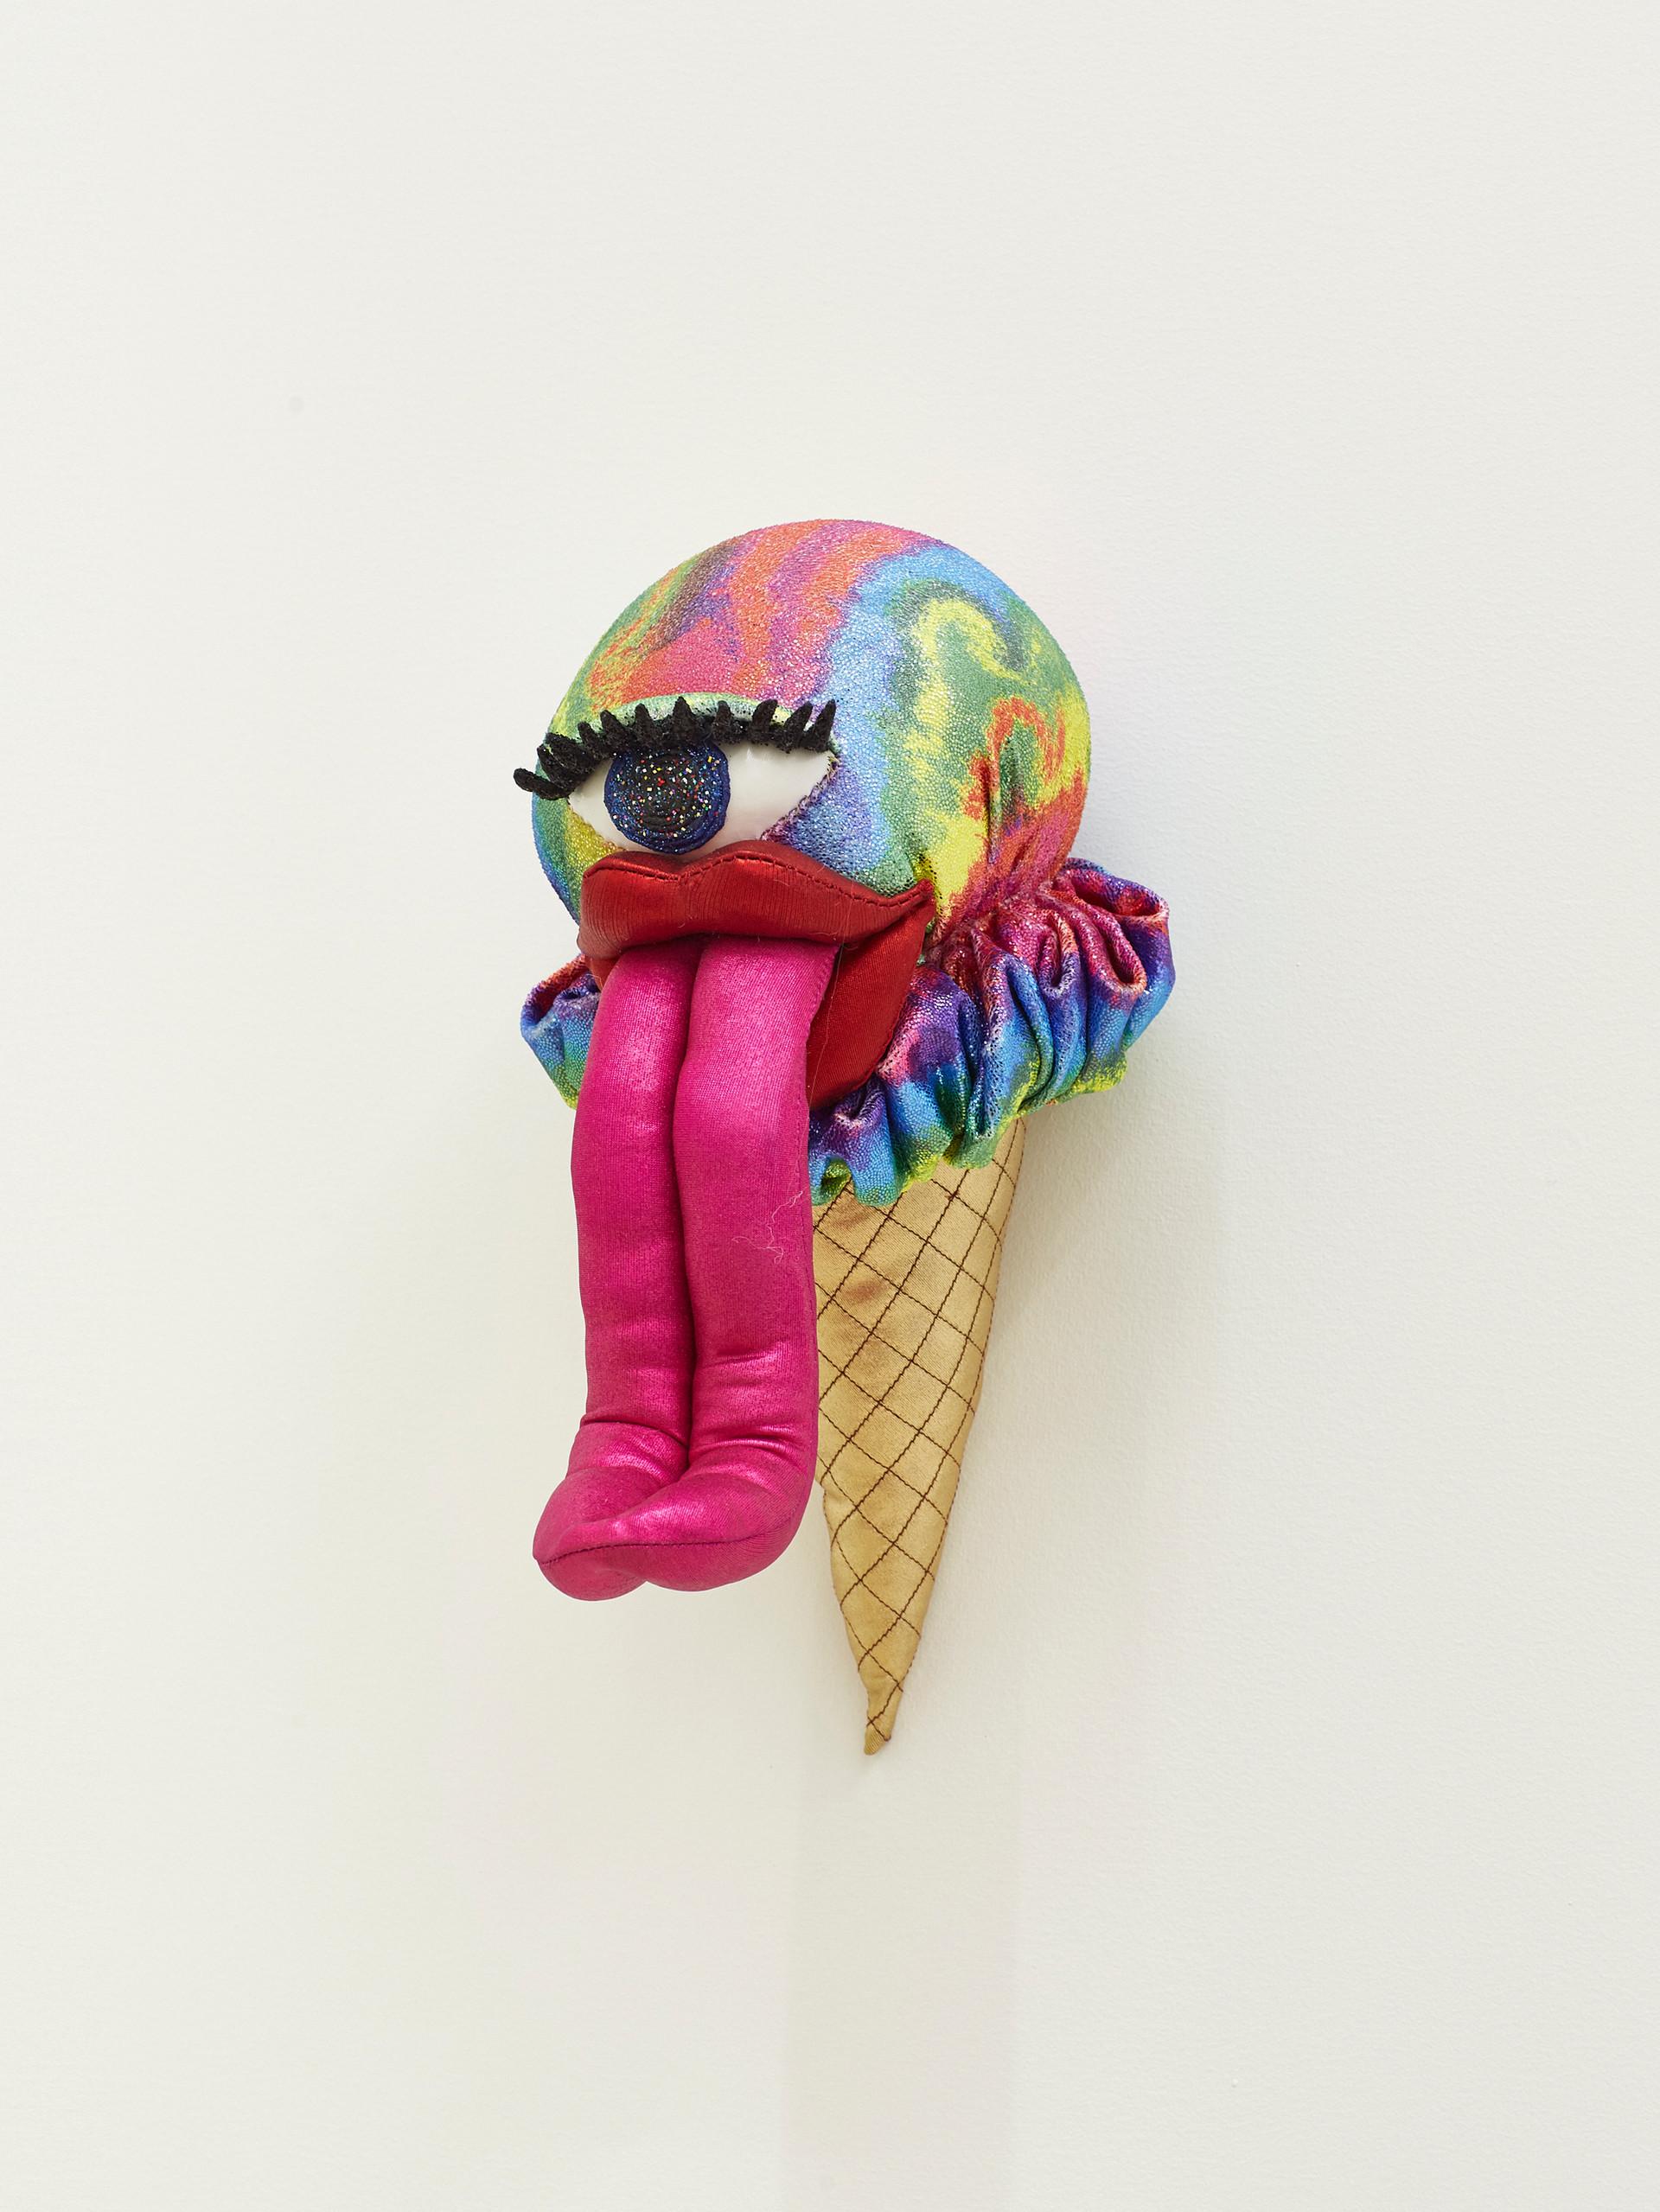 Fruity Acid Trip, 2019 Acrylic, felt, fiberfill, glitter, spandex, stretch velvet, string, wire, and vinyl 11 x 5.5 x 9 inches